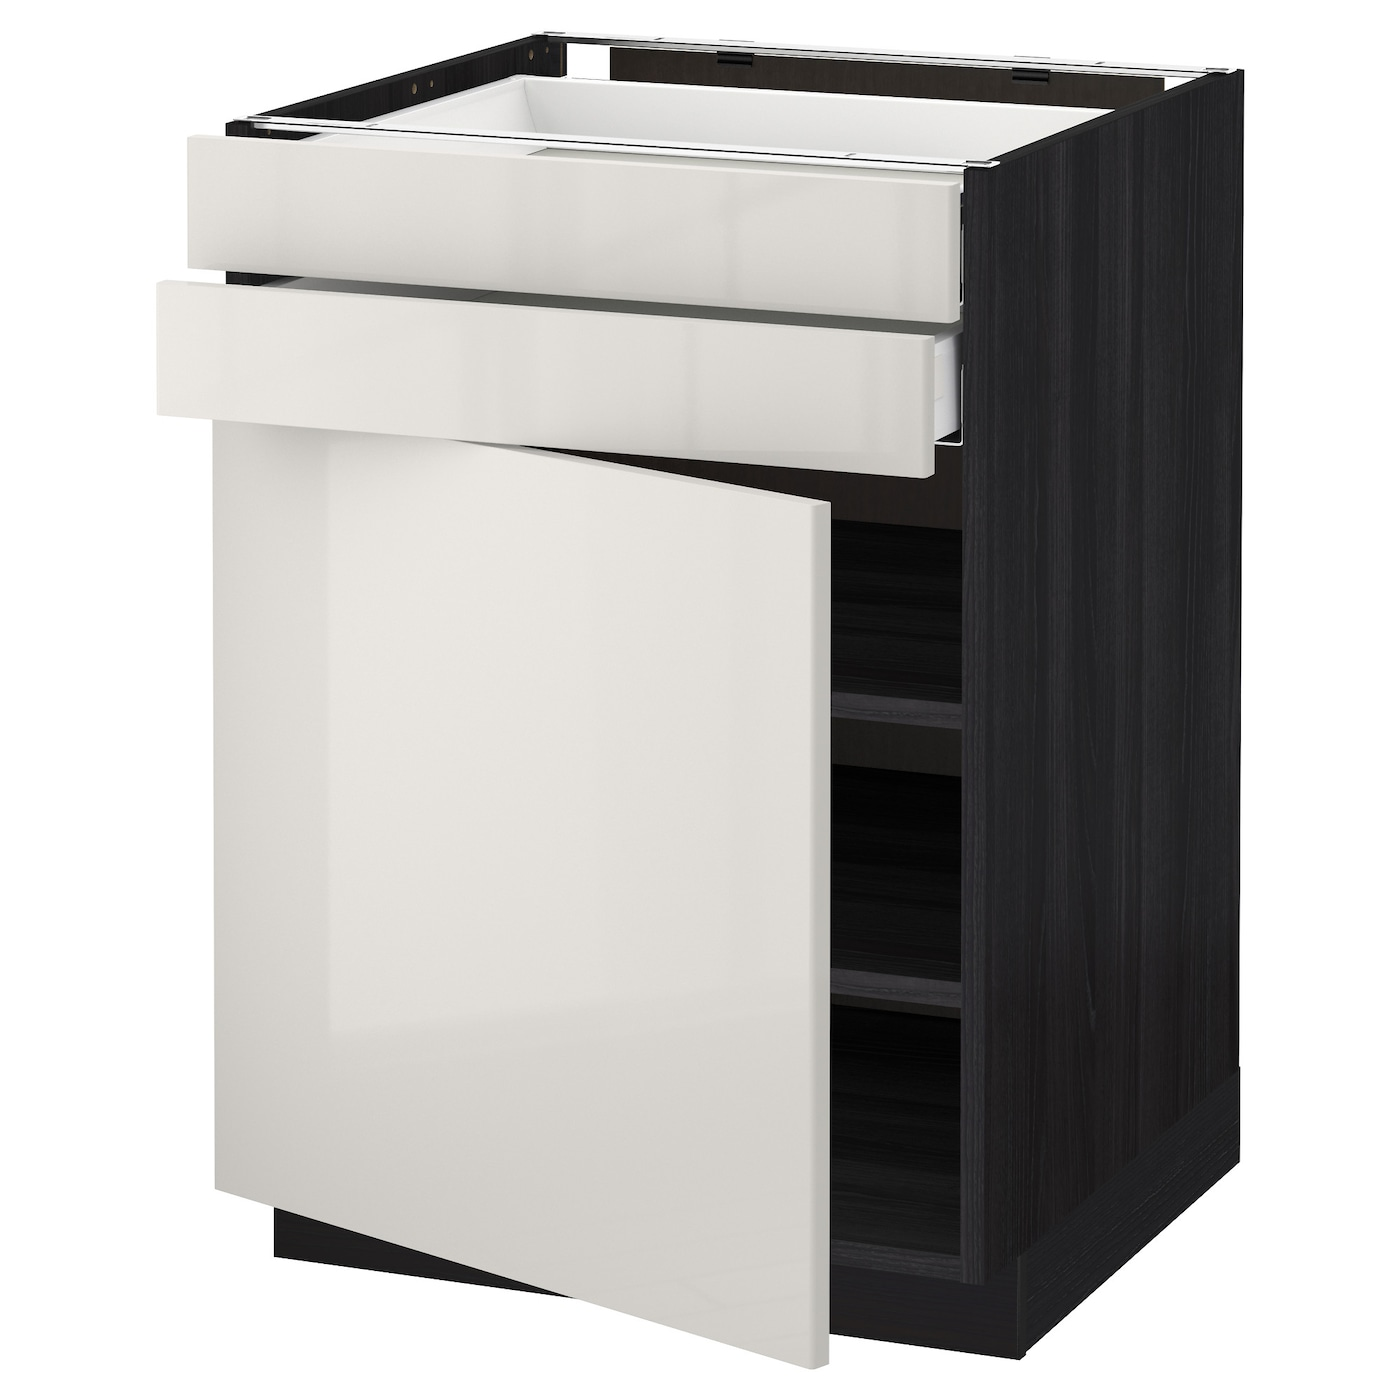 Ringhult Grey Kitchen: METOD/MAXIMERA Base Cabinet W Door/2 Drawers Black